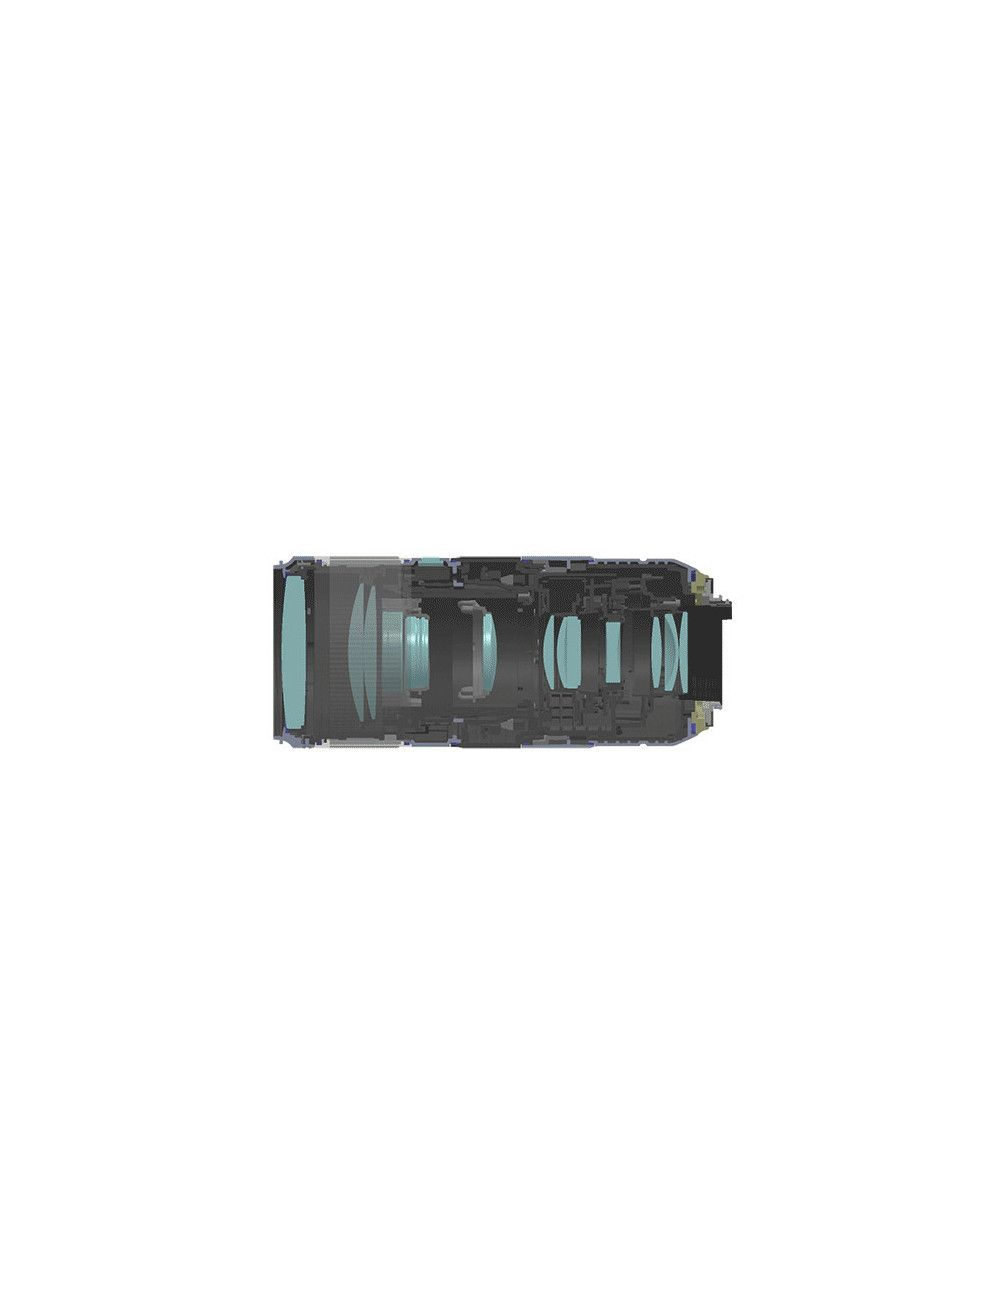 Panasonic Lumix DMC-FZ300 y ZOOM LEICA 25-600 en Chile www.apertura.cl